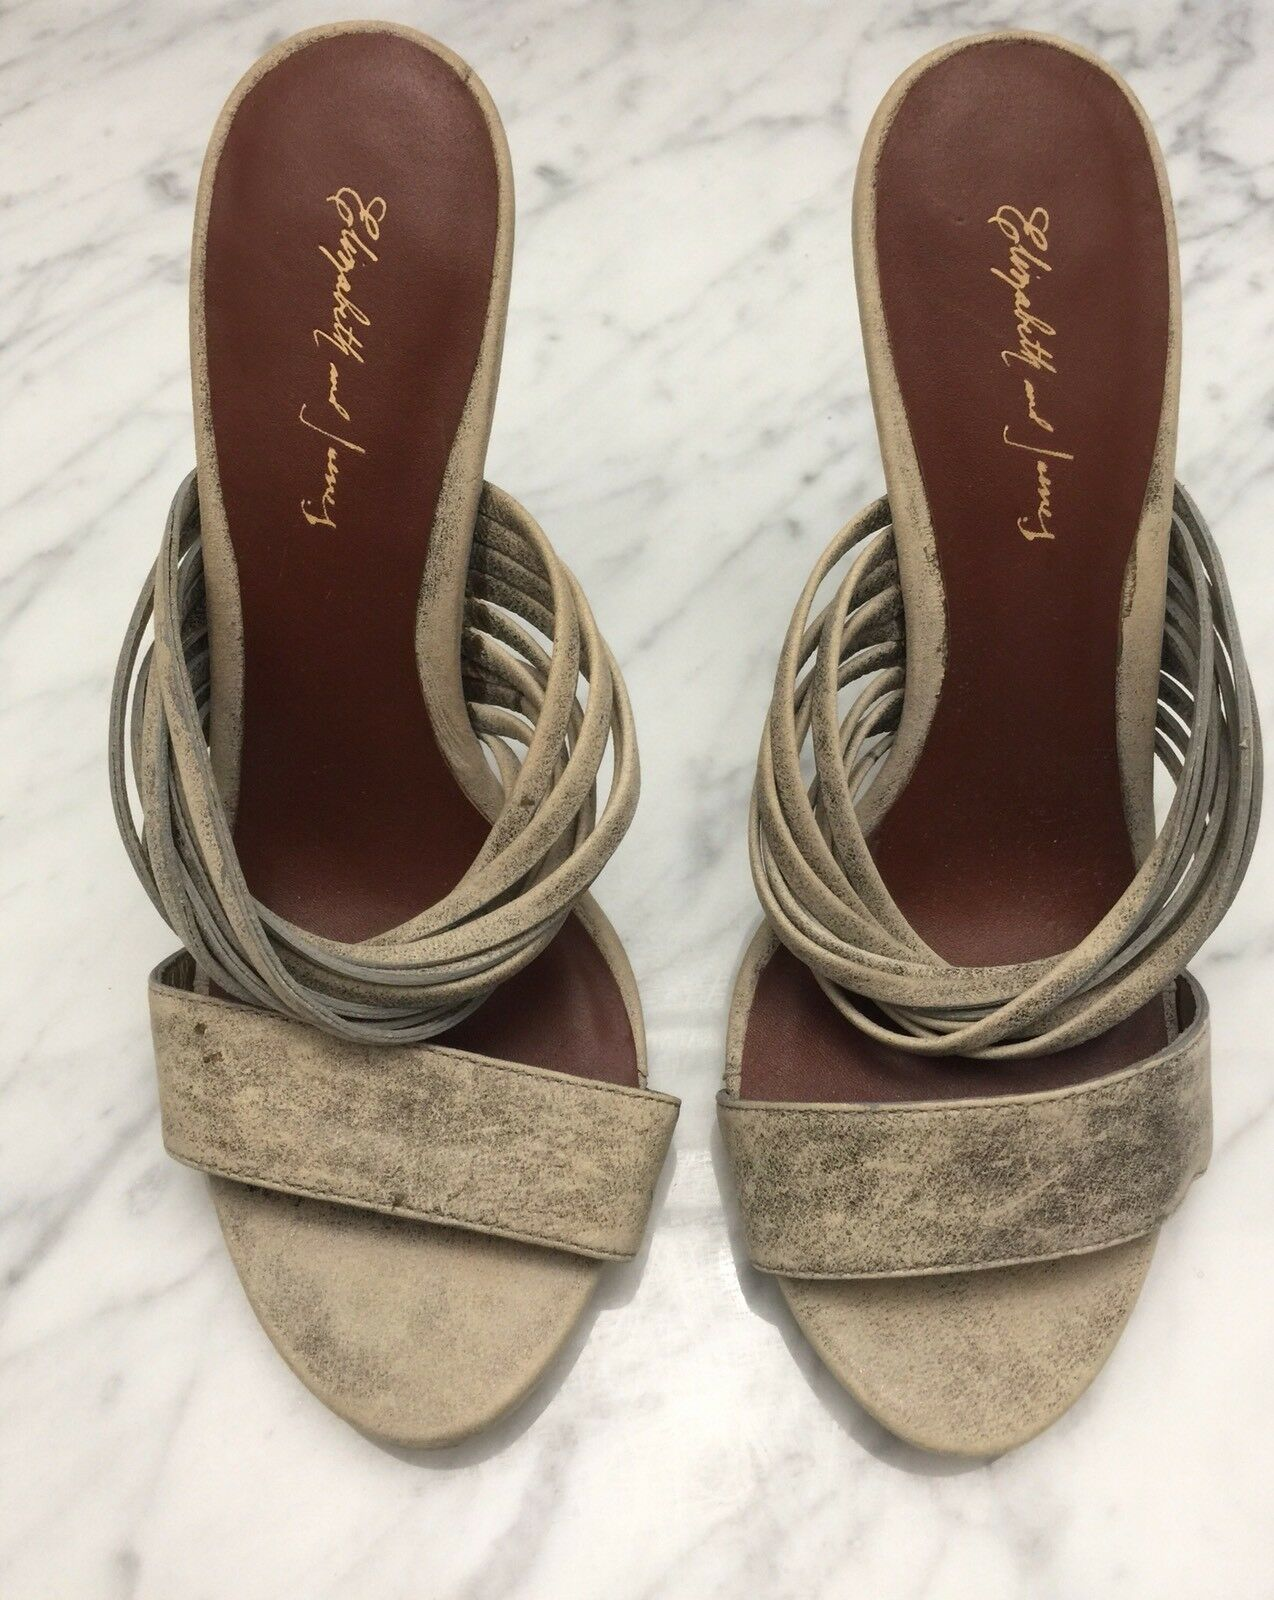 NEW ELIZABETH & JAMES Distressed Grey Tan Leather Leather Leather Strappy Stilettos Heels Sz 6M 9b824f